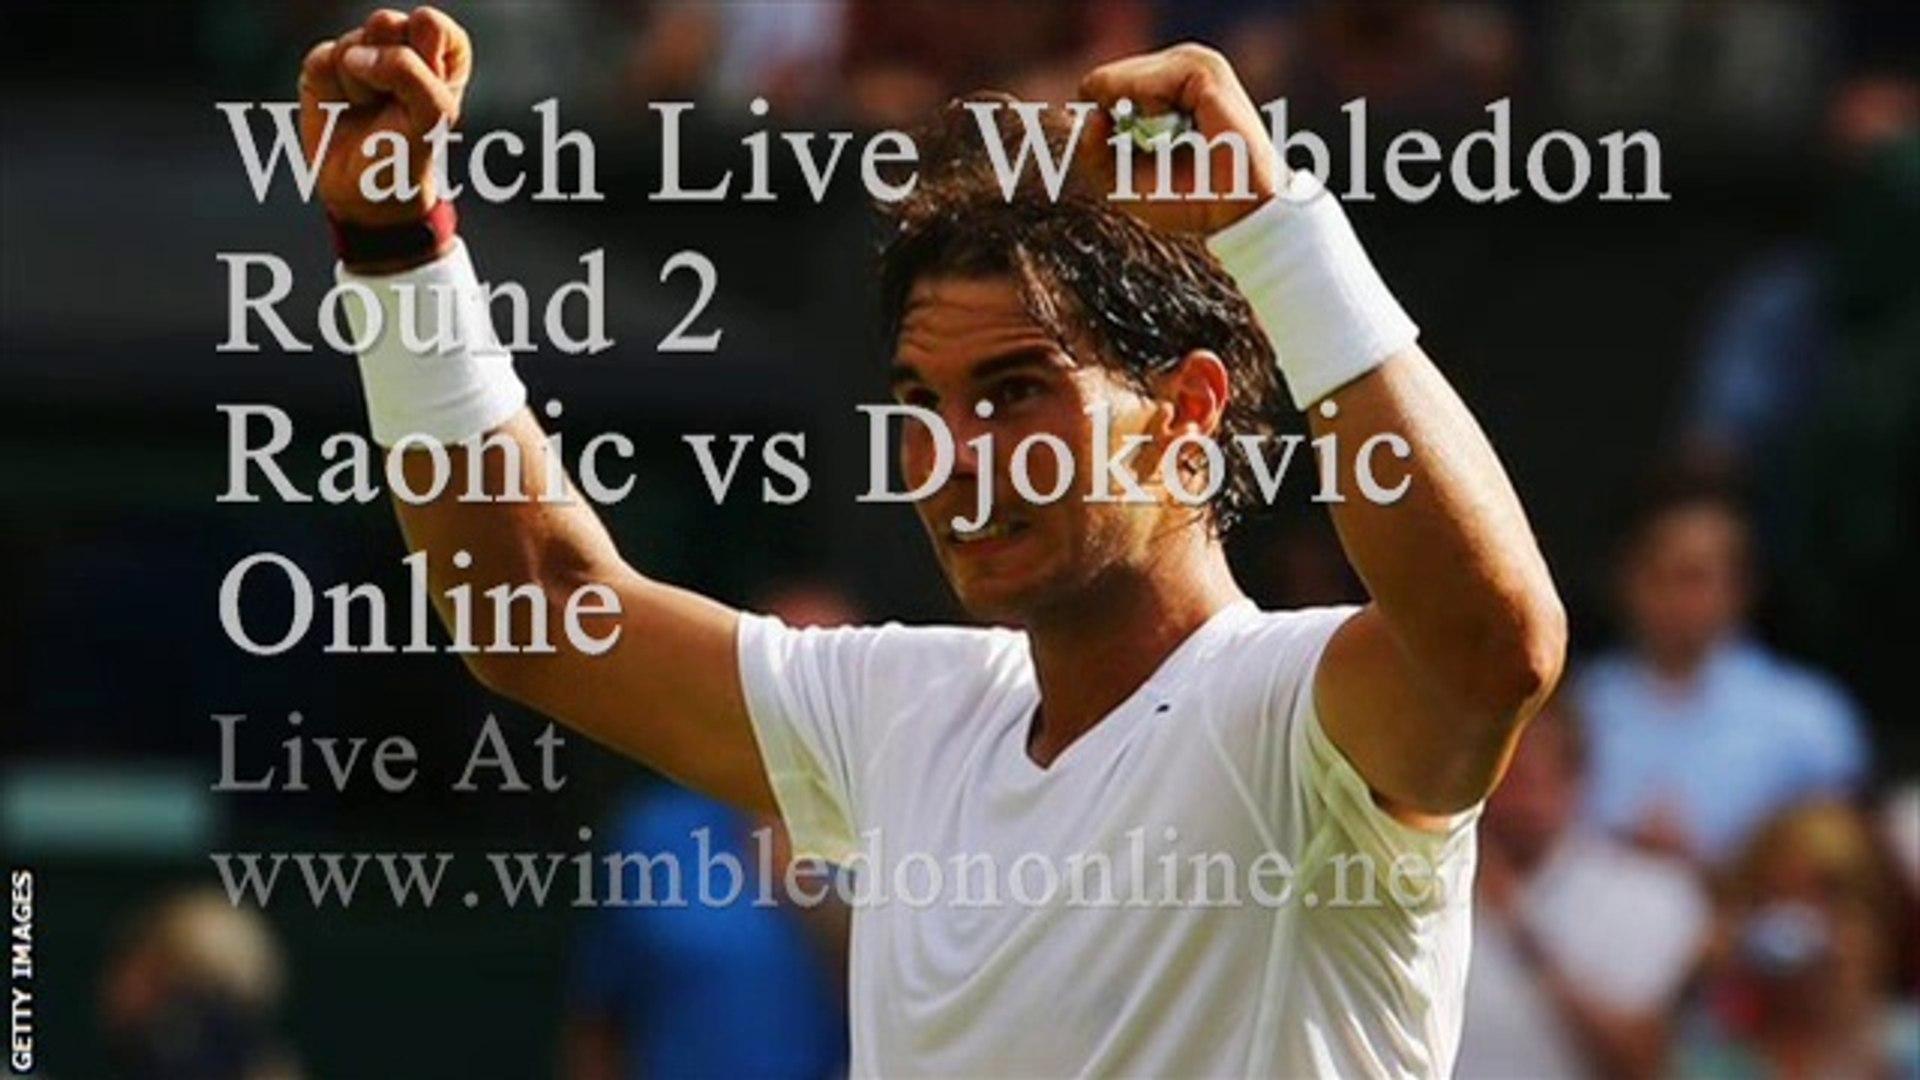 Live Raonic Vs Djokovic Streaming Video Dailymotion